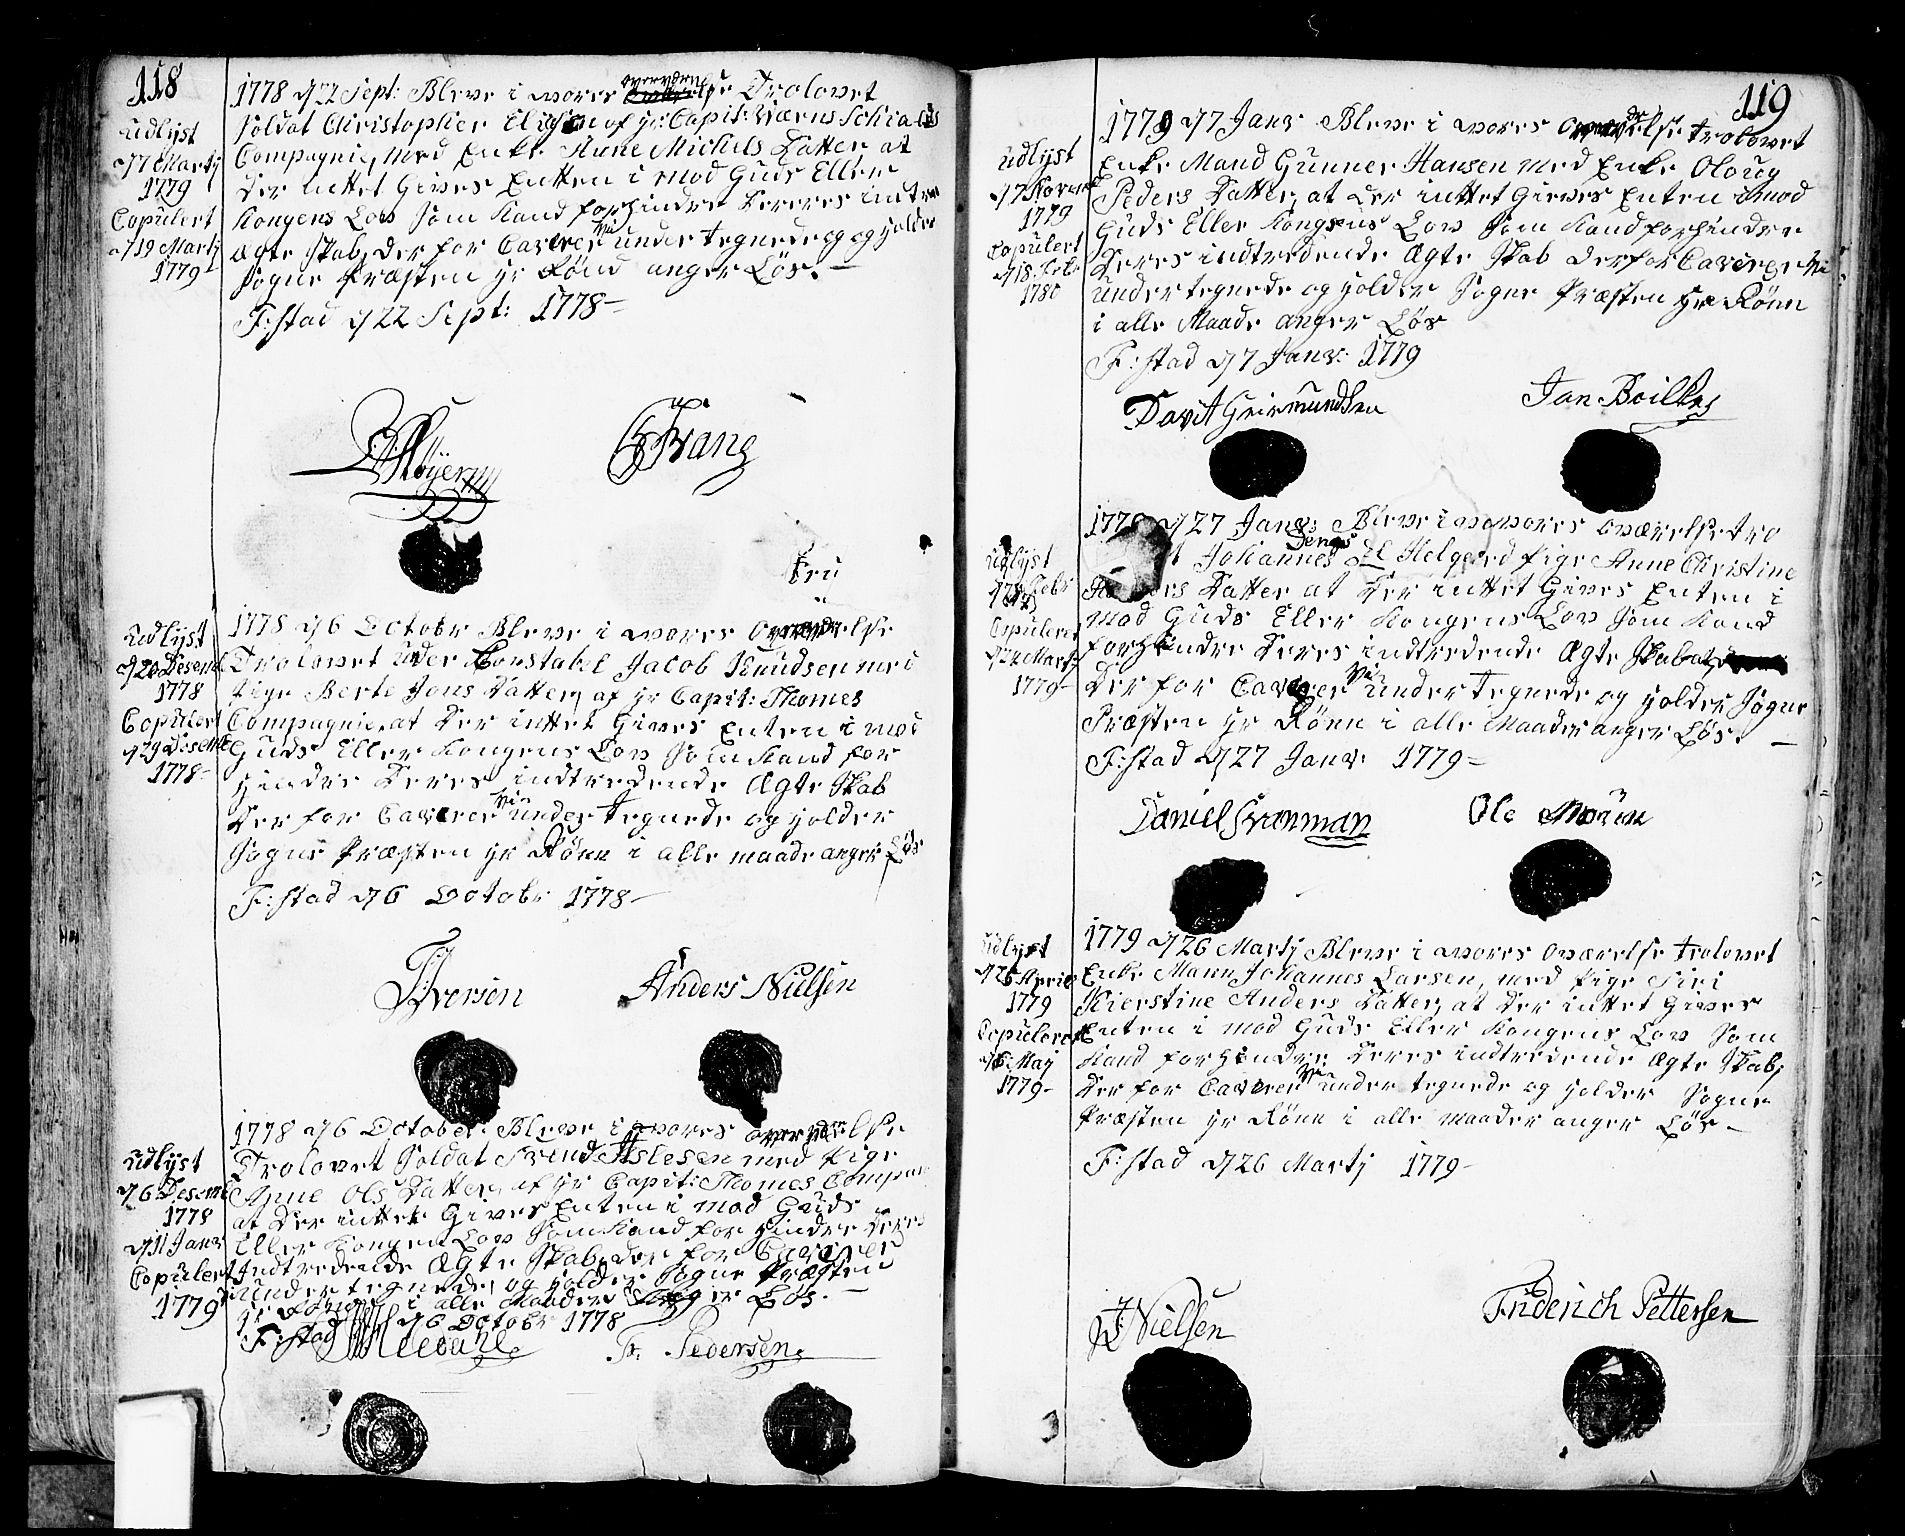 SAO, Fredrikstad prestekontor Kirkebøker, F/Fa/L0002: Ministerialbok nr. 2, 1750-1804, s. 118-119